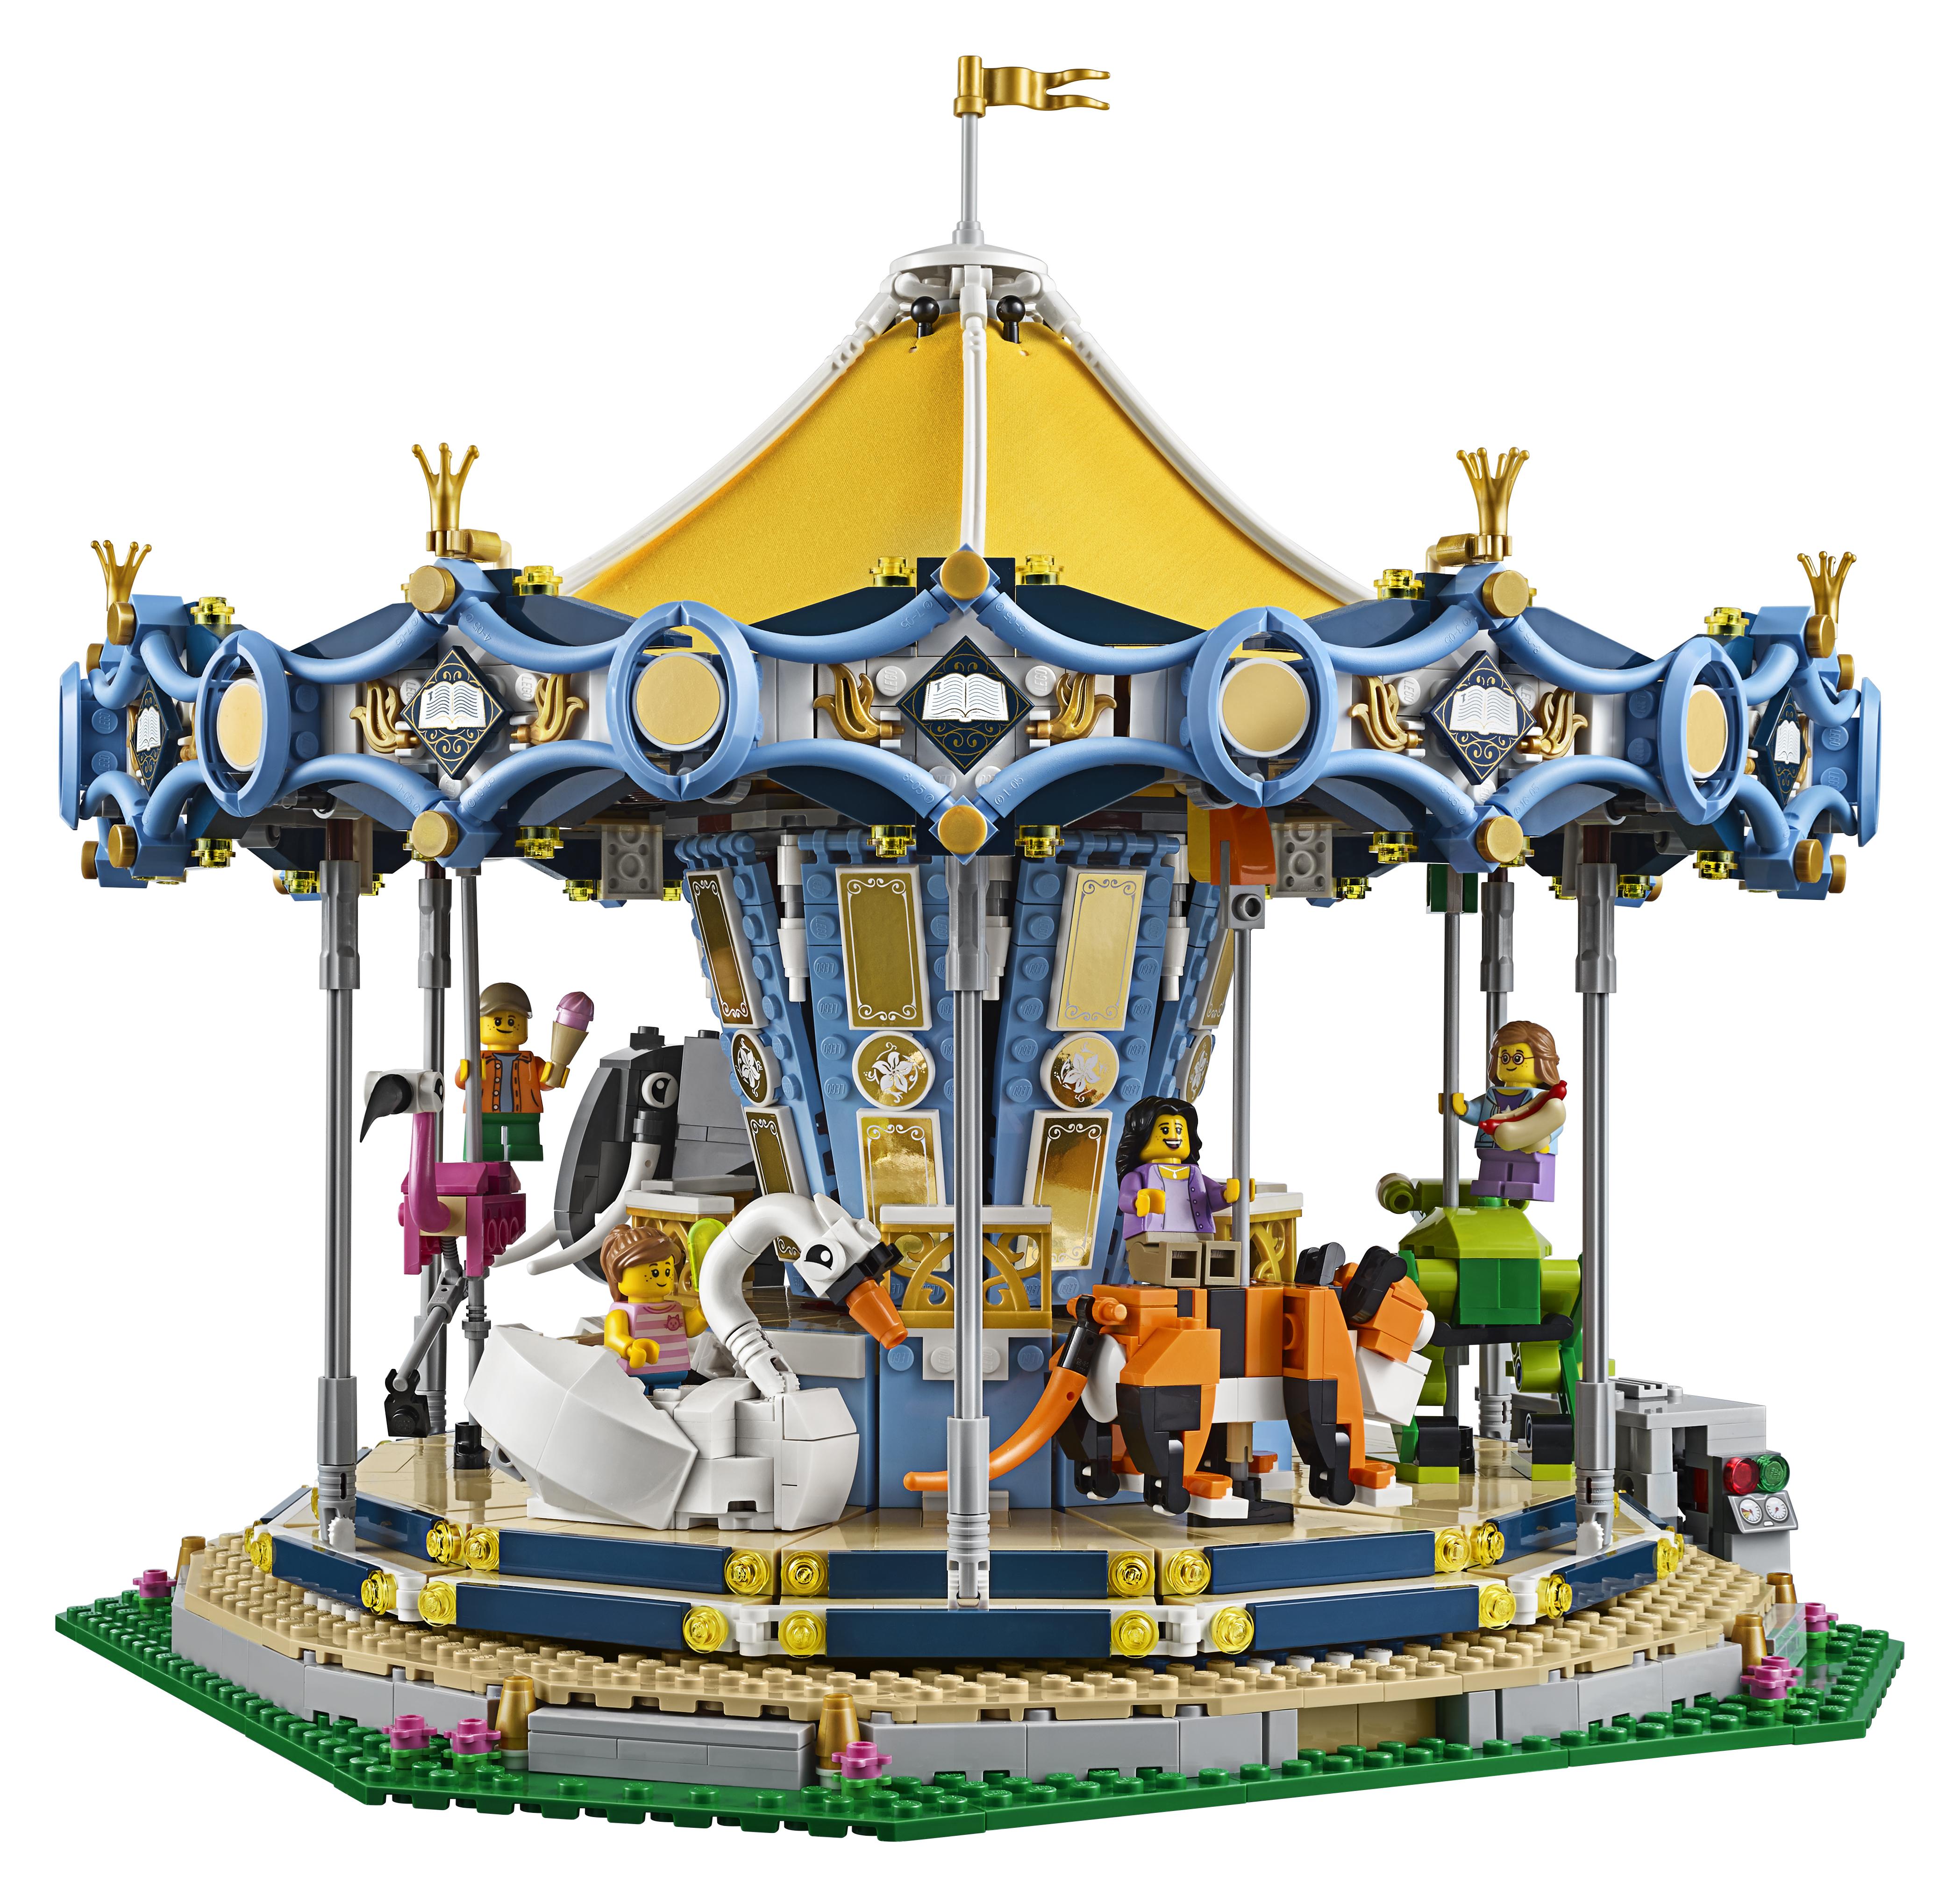 [MOC] Angela Ziegler aka Mercy. LEGO Overwatch.[micro update] 33483290923_548b098f6e_o